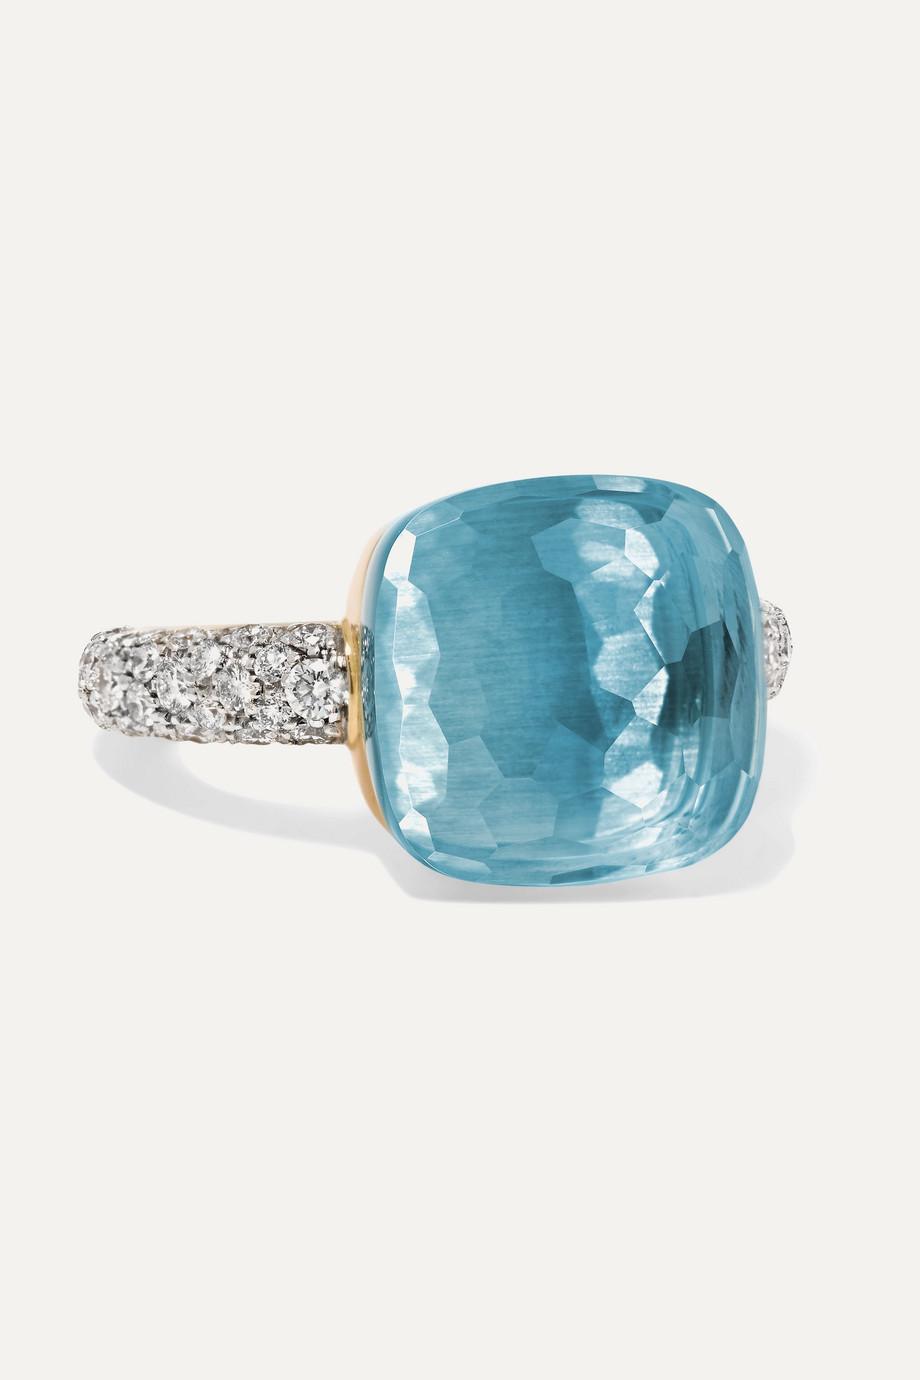 Pomellato Nudo 18-karat white gold, topaz and diamond ring